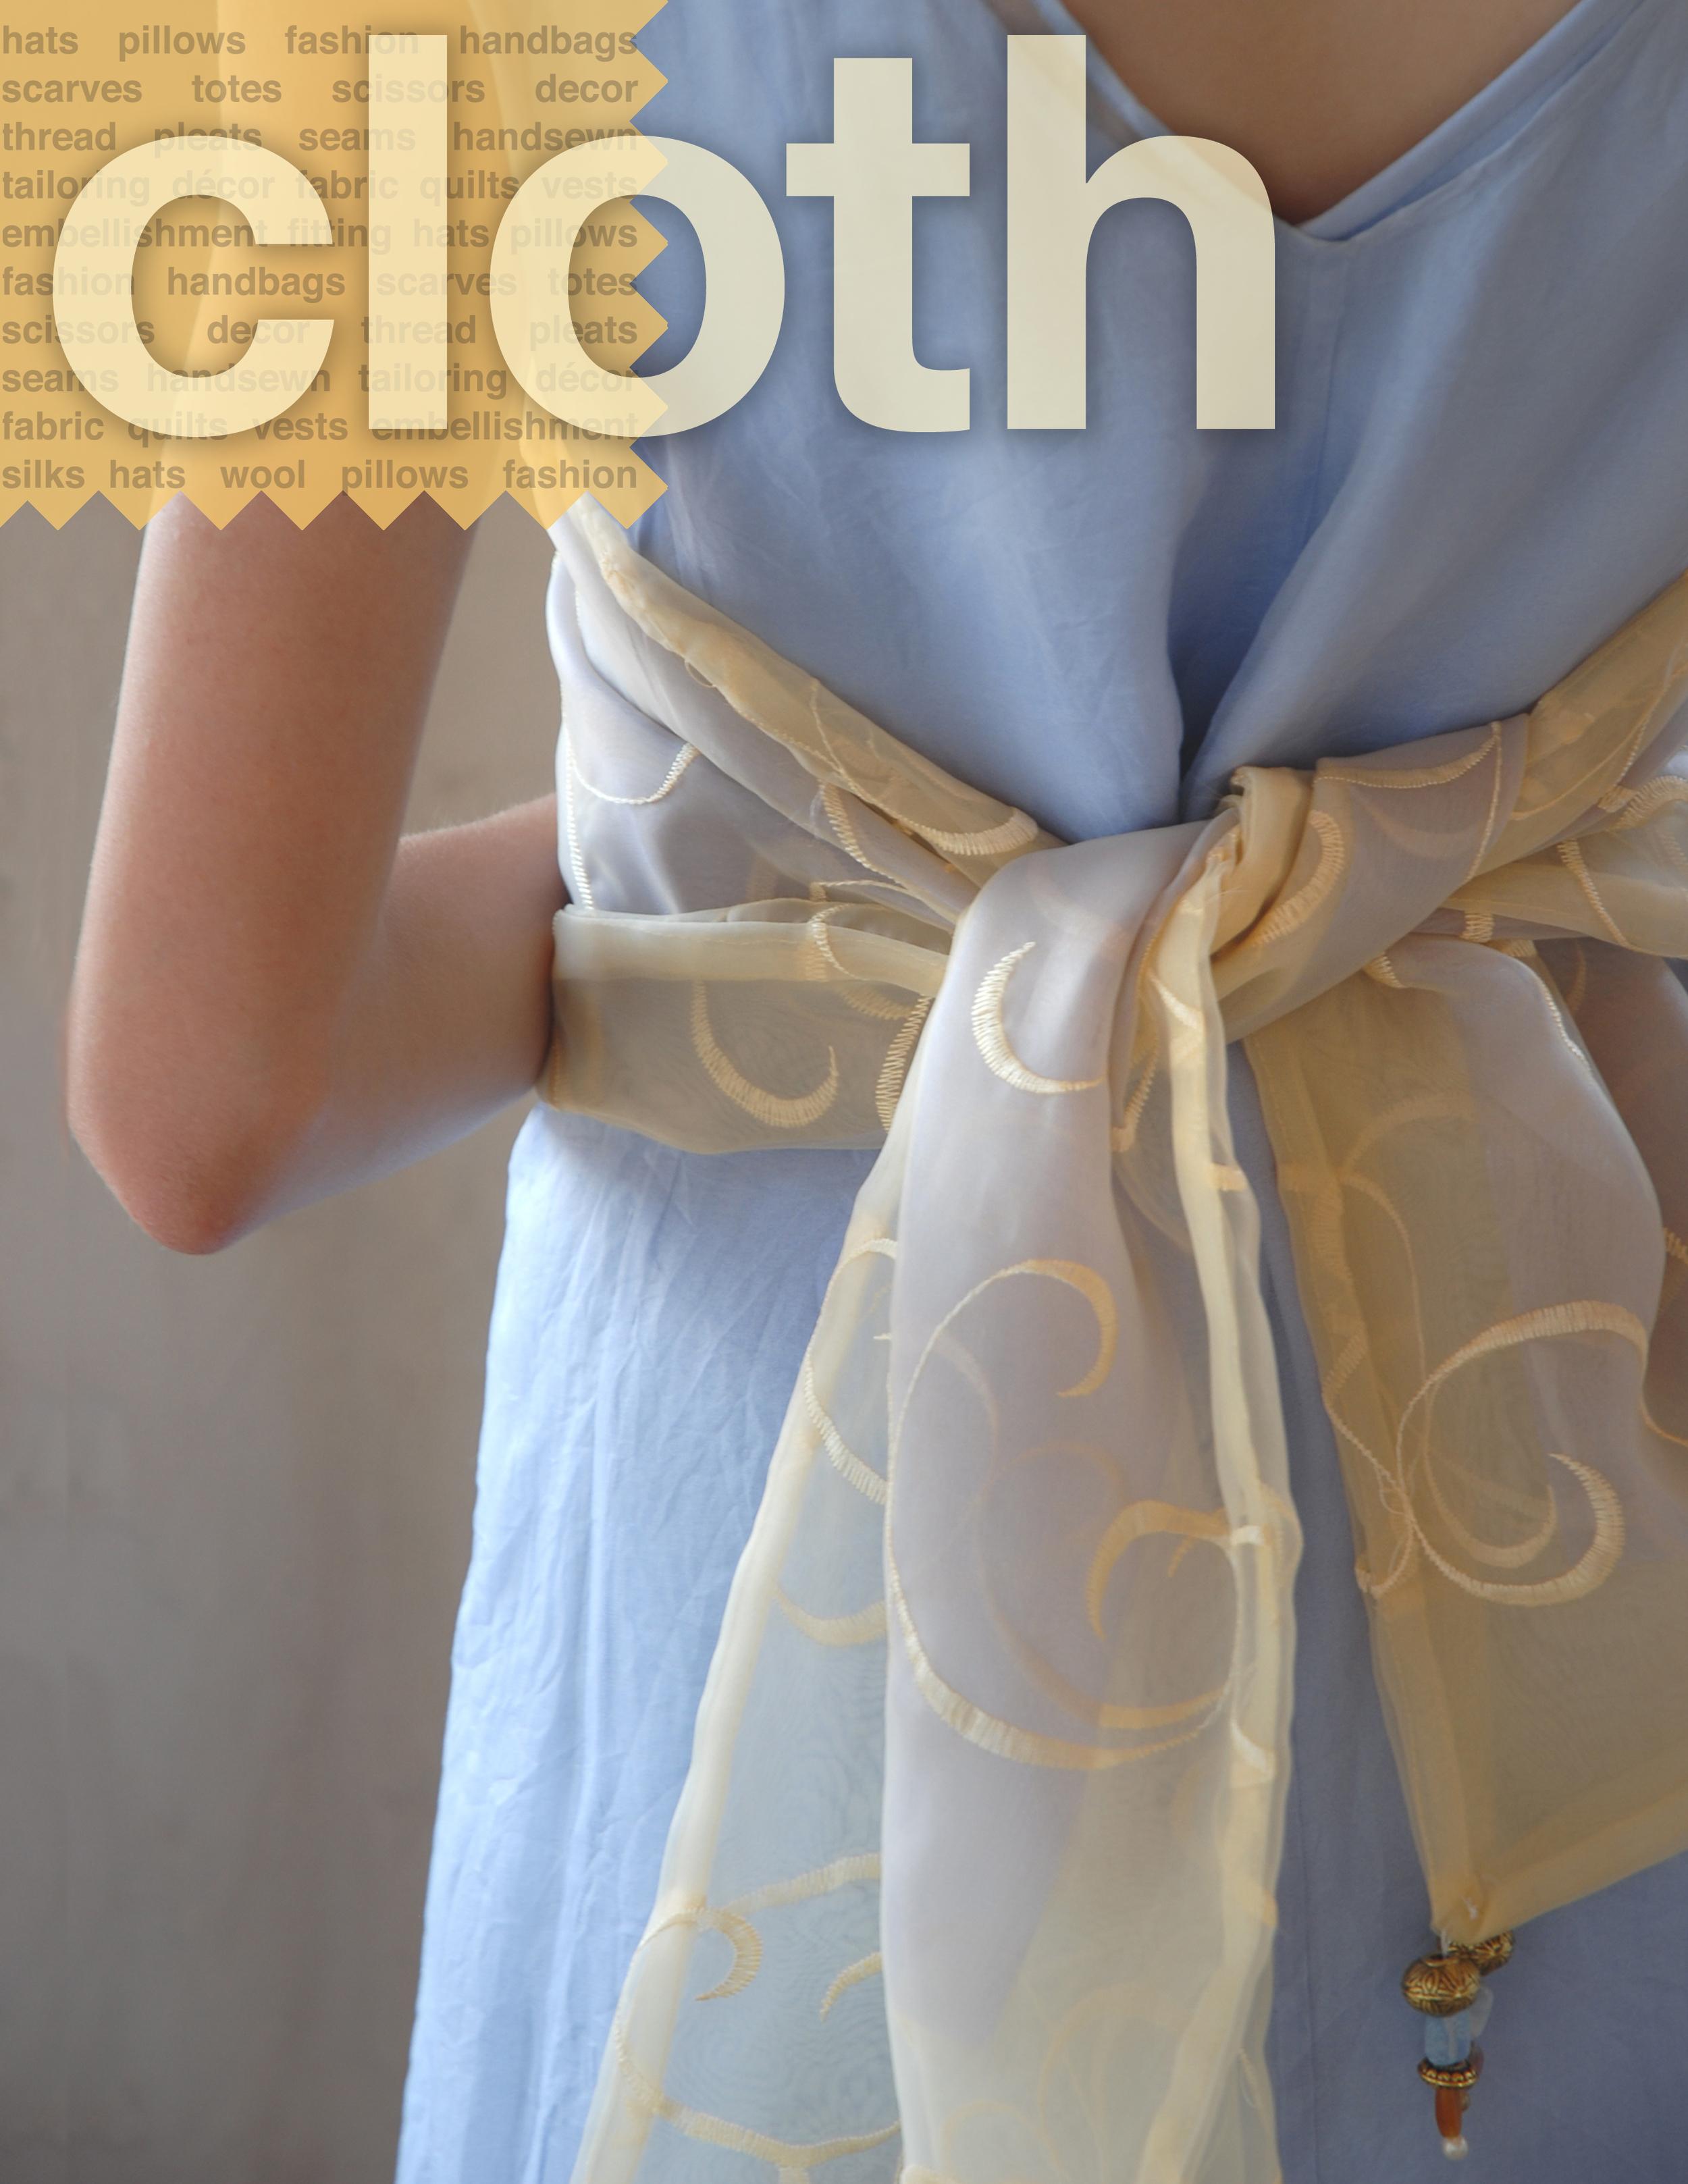 cloth cover camille 2.jpg